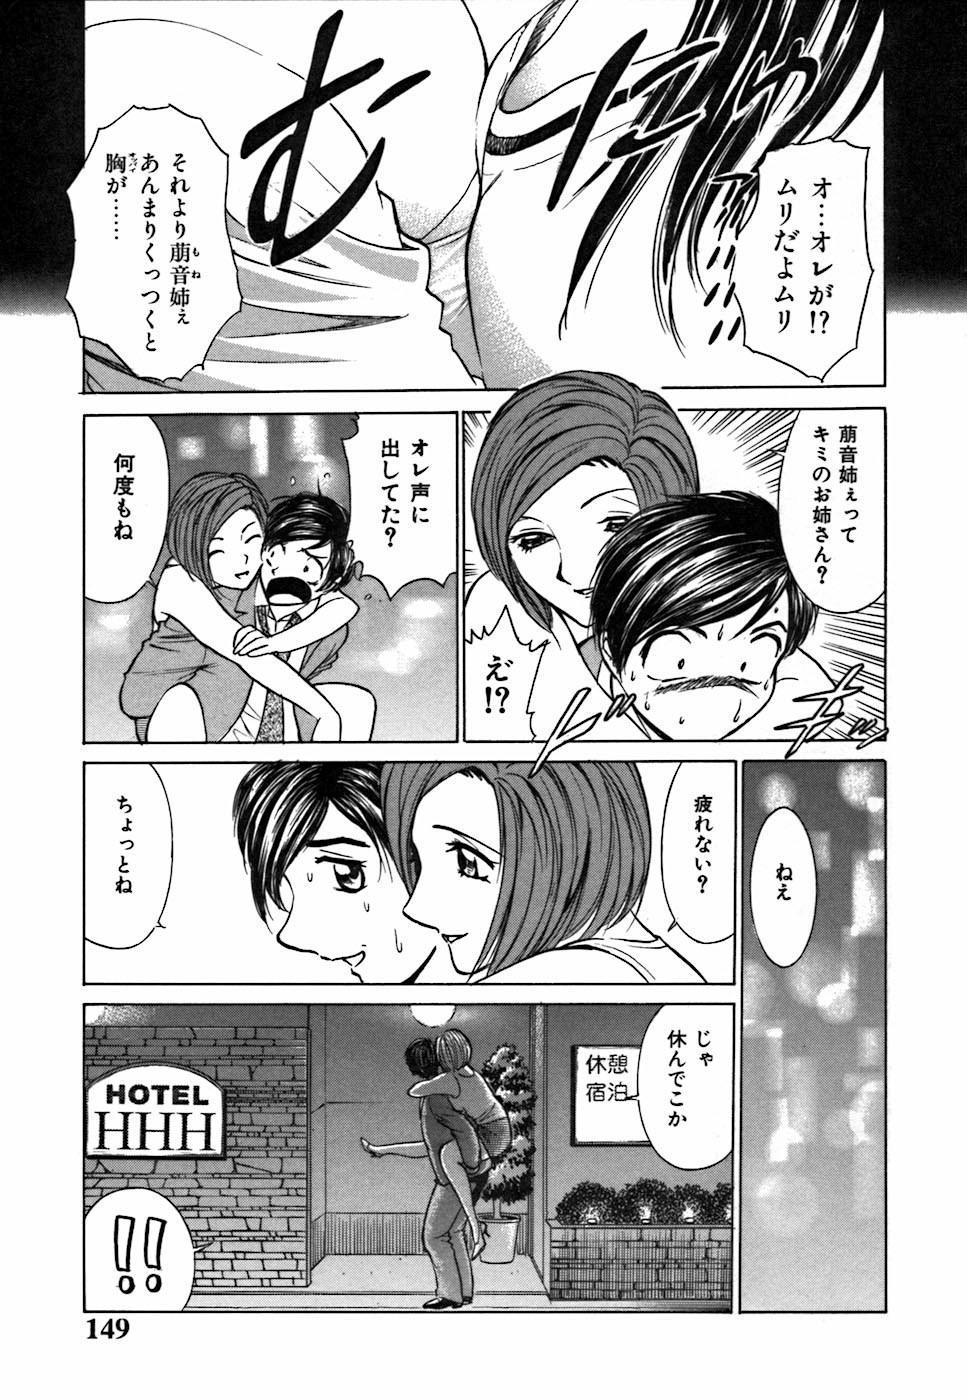 Kimi ga Nozomu Katachi | Appearance for which you hope 148